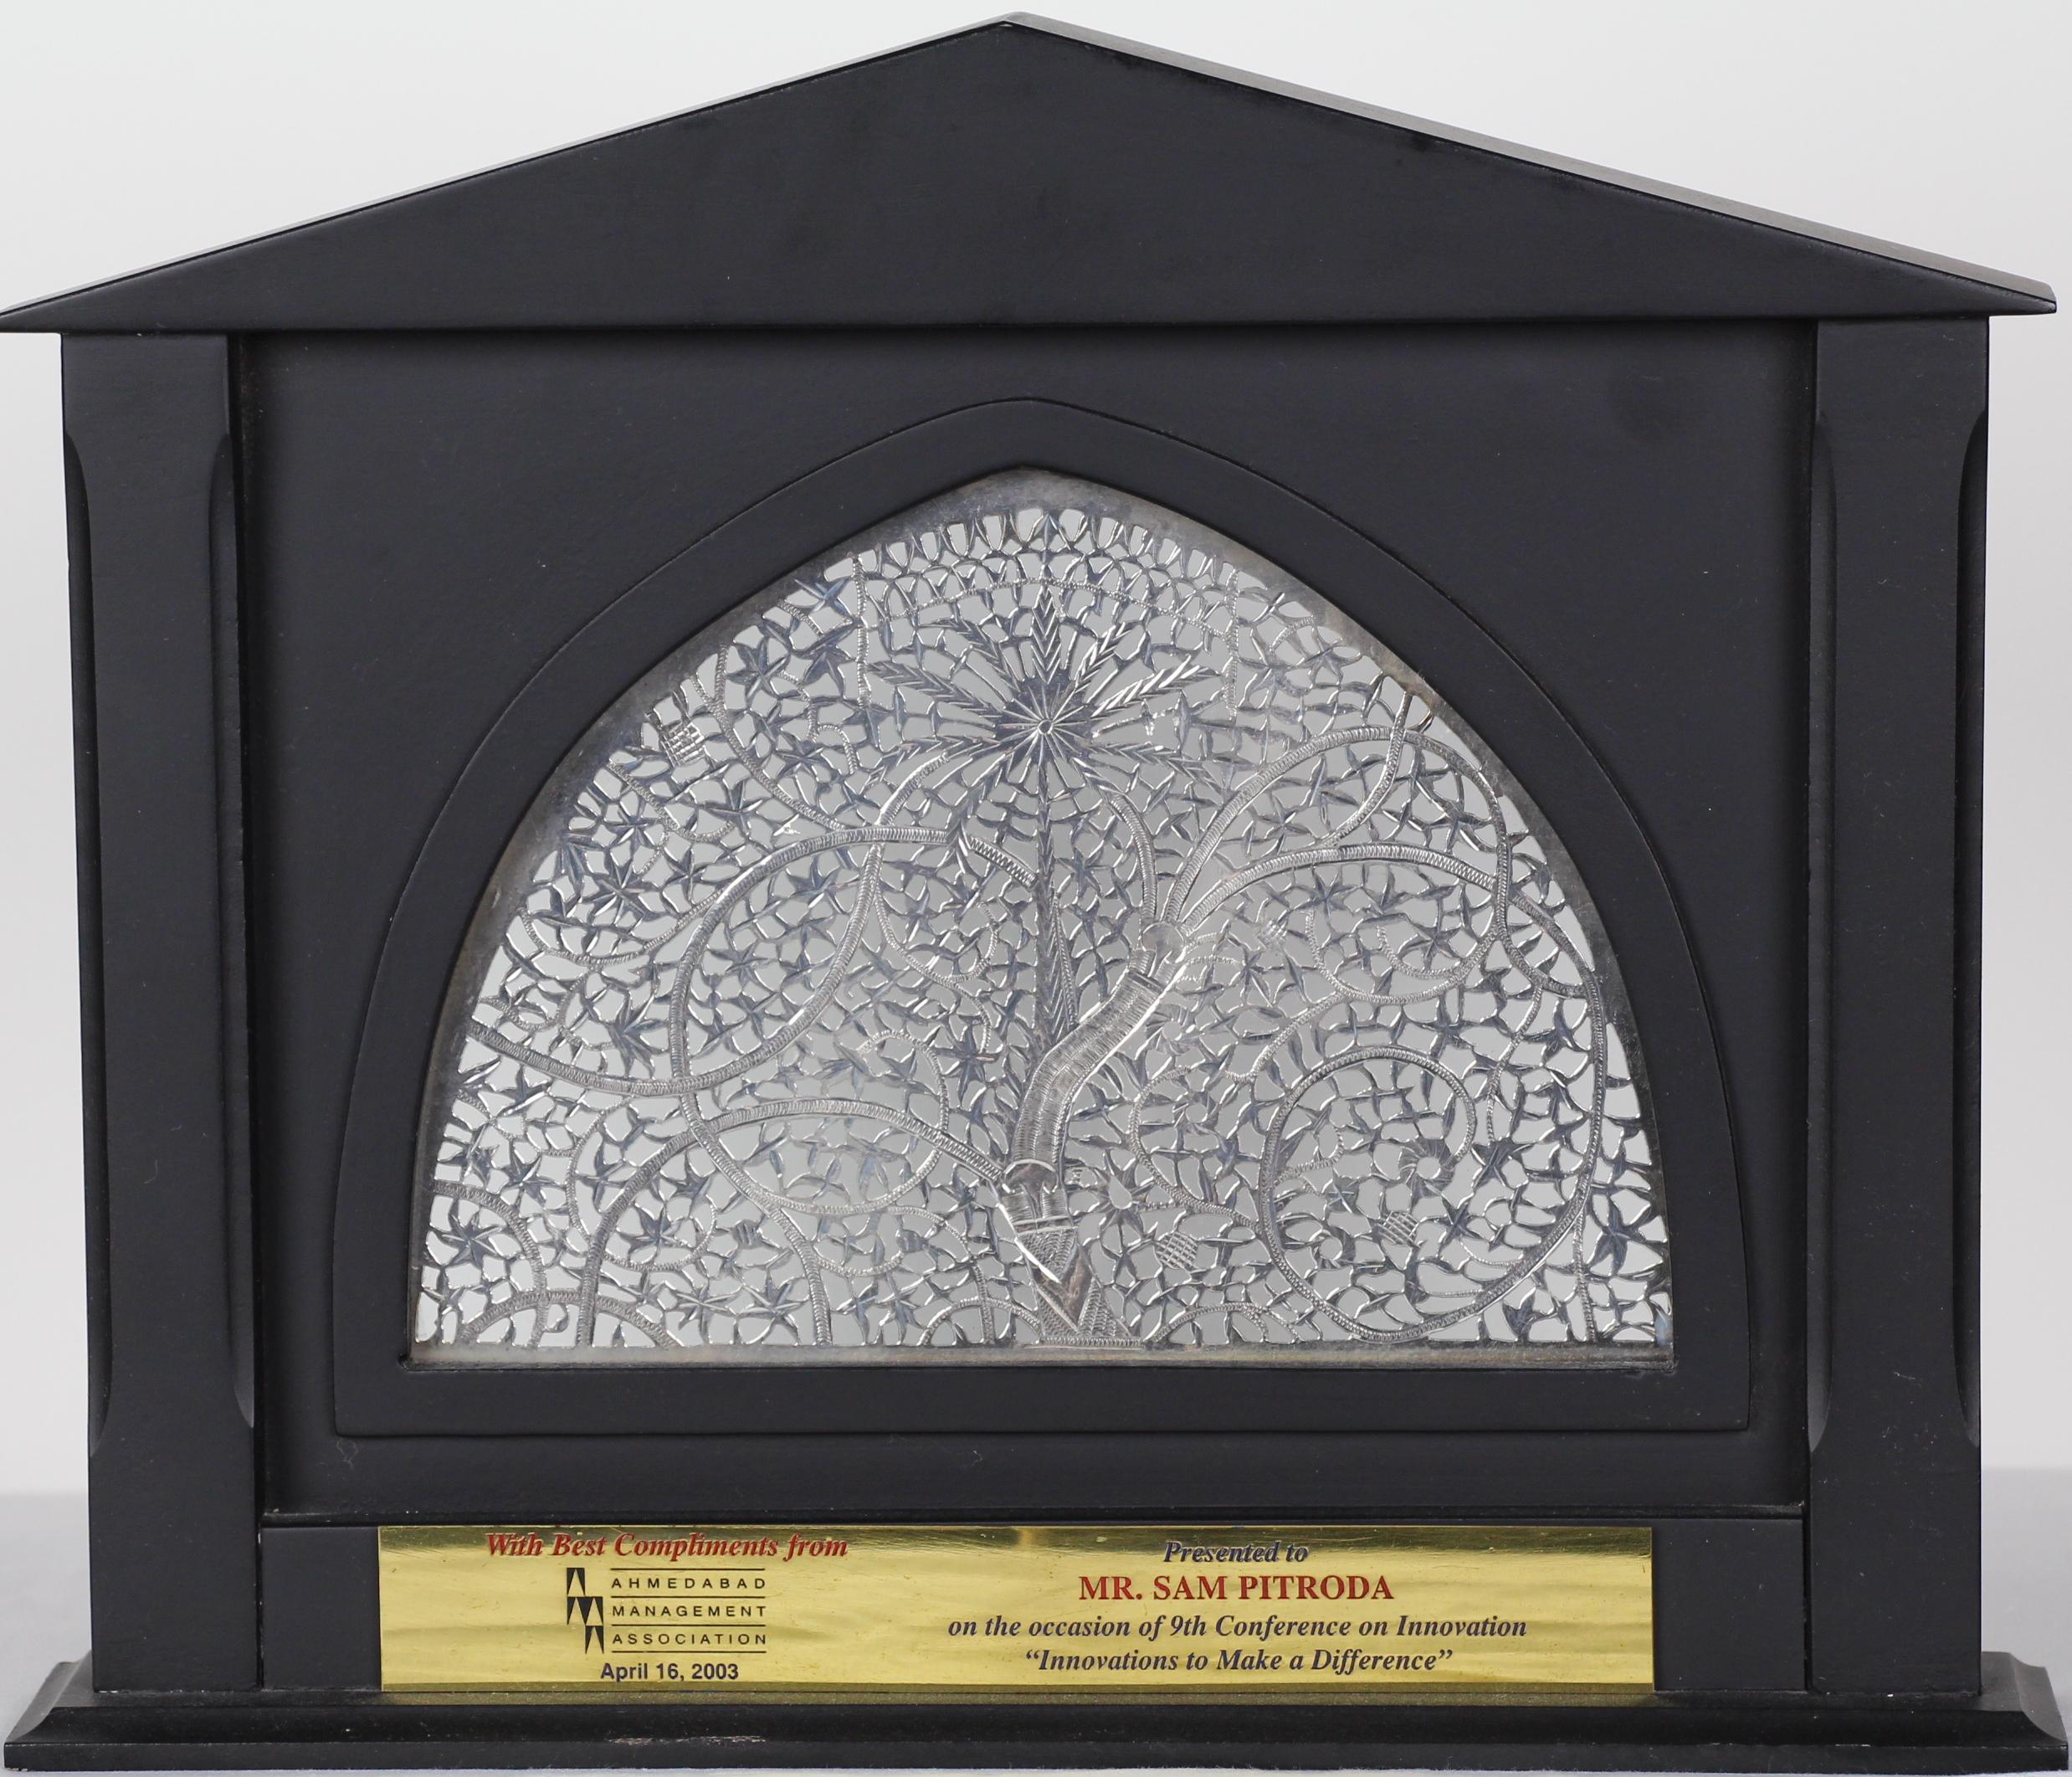 Recognition Award, Ahmadabad Management Association, 2003